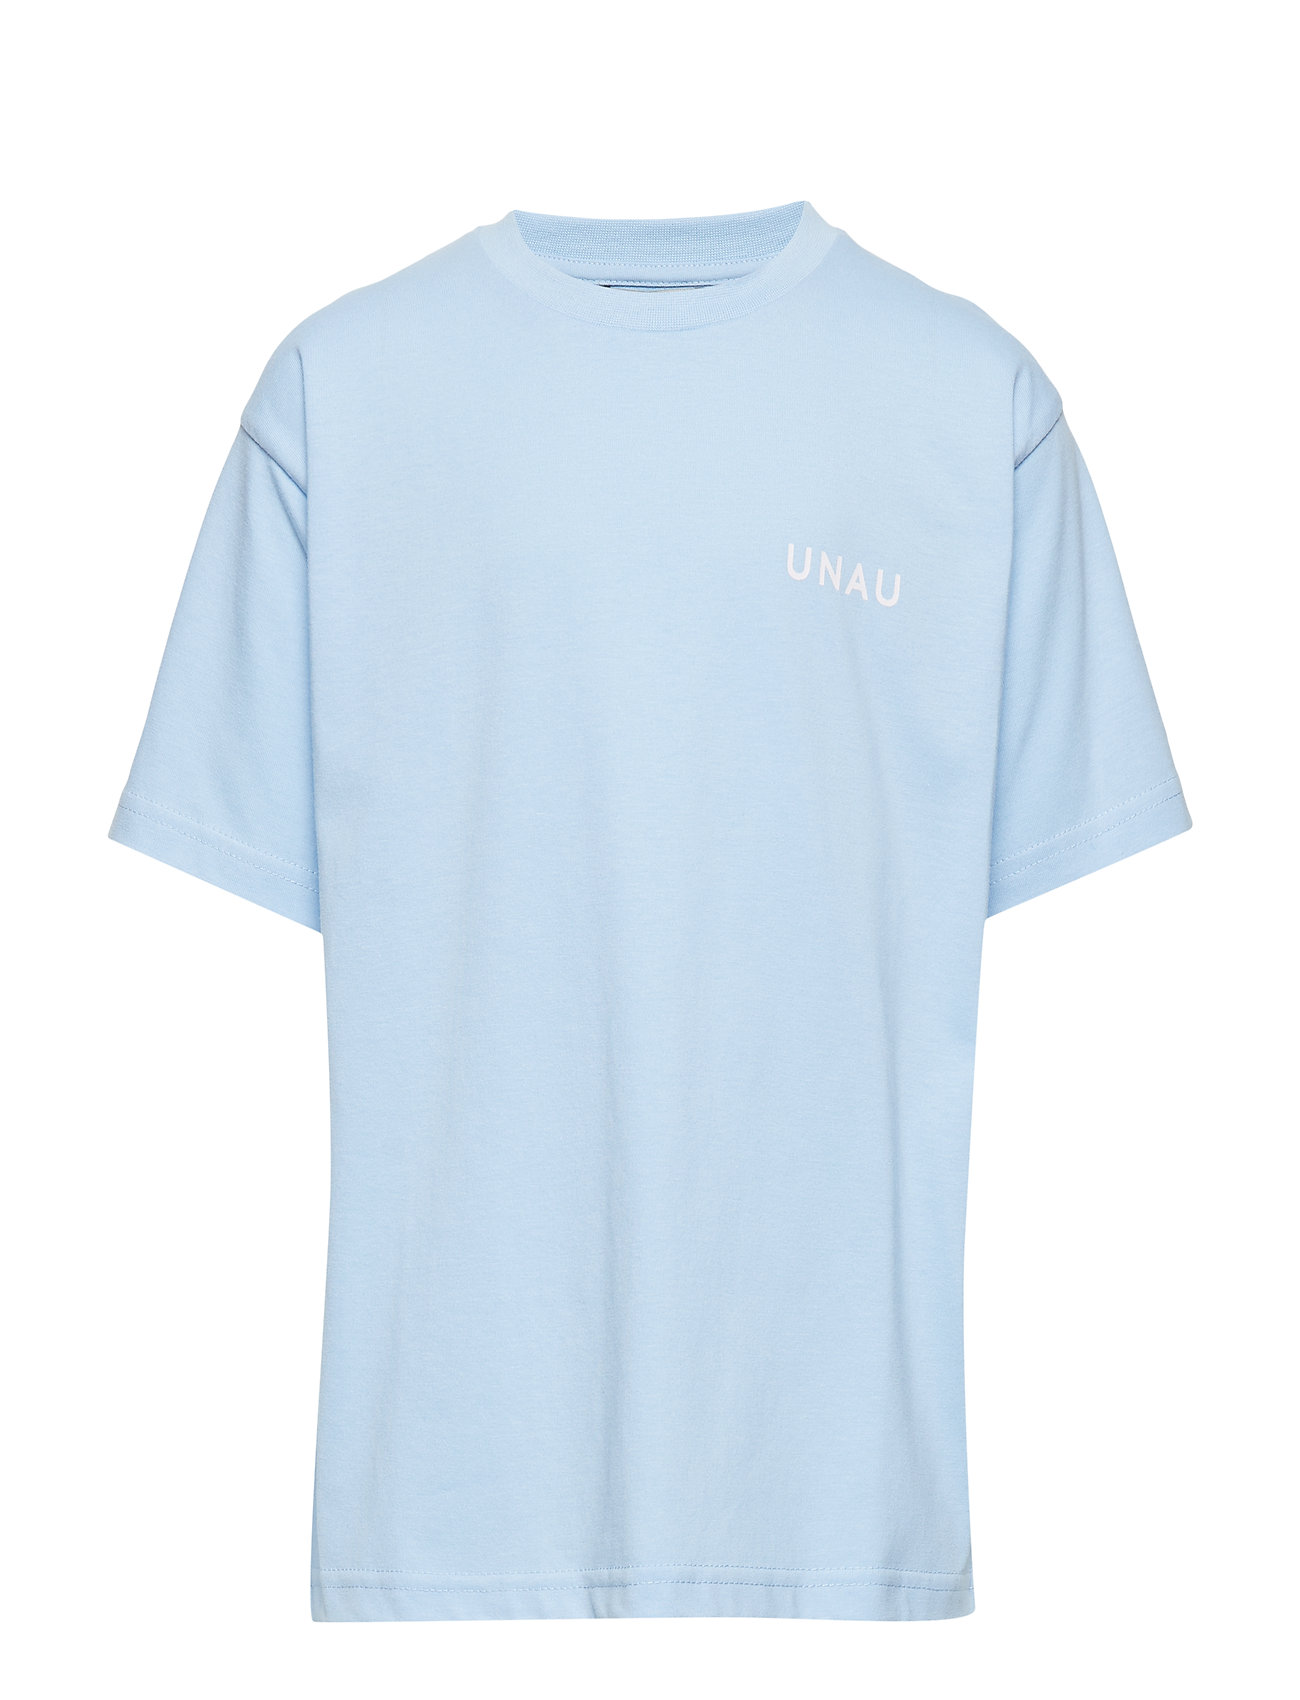 Unauthorized Armando Short T-shirt, K - PLACID BLUE